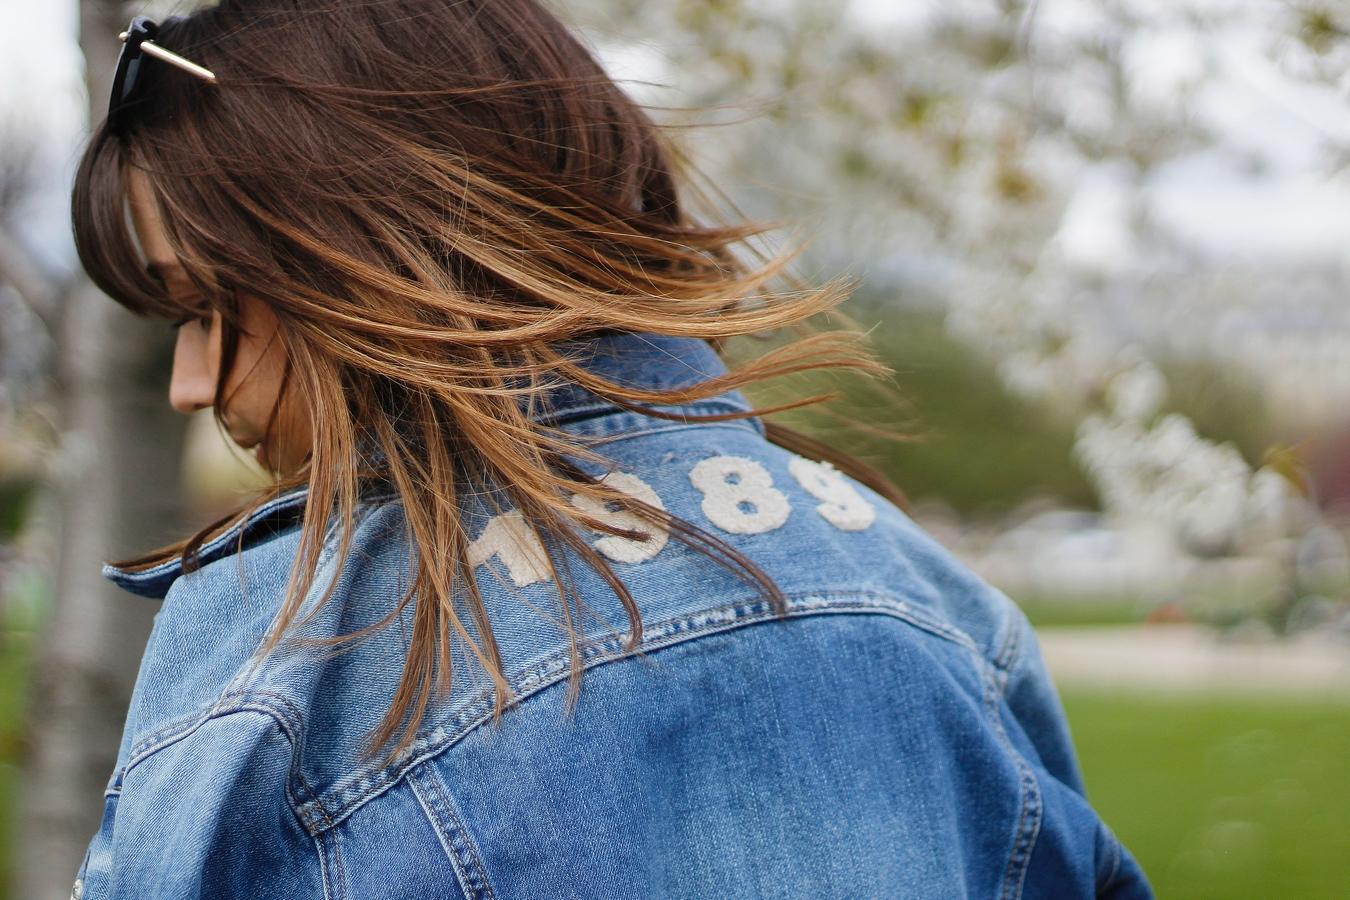 Blog mode femme Paris - Du style, Madame - Streetstyle - kaporal - jean